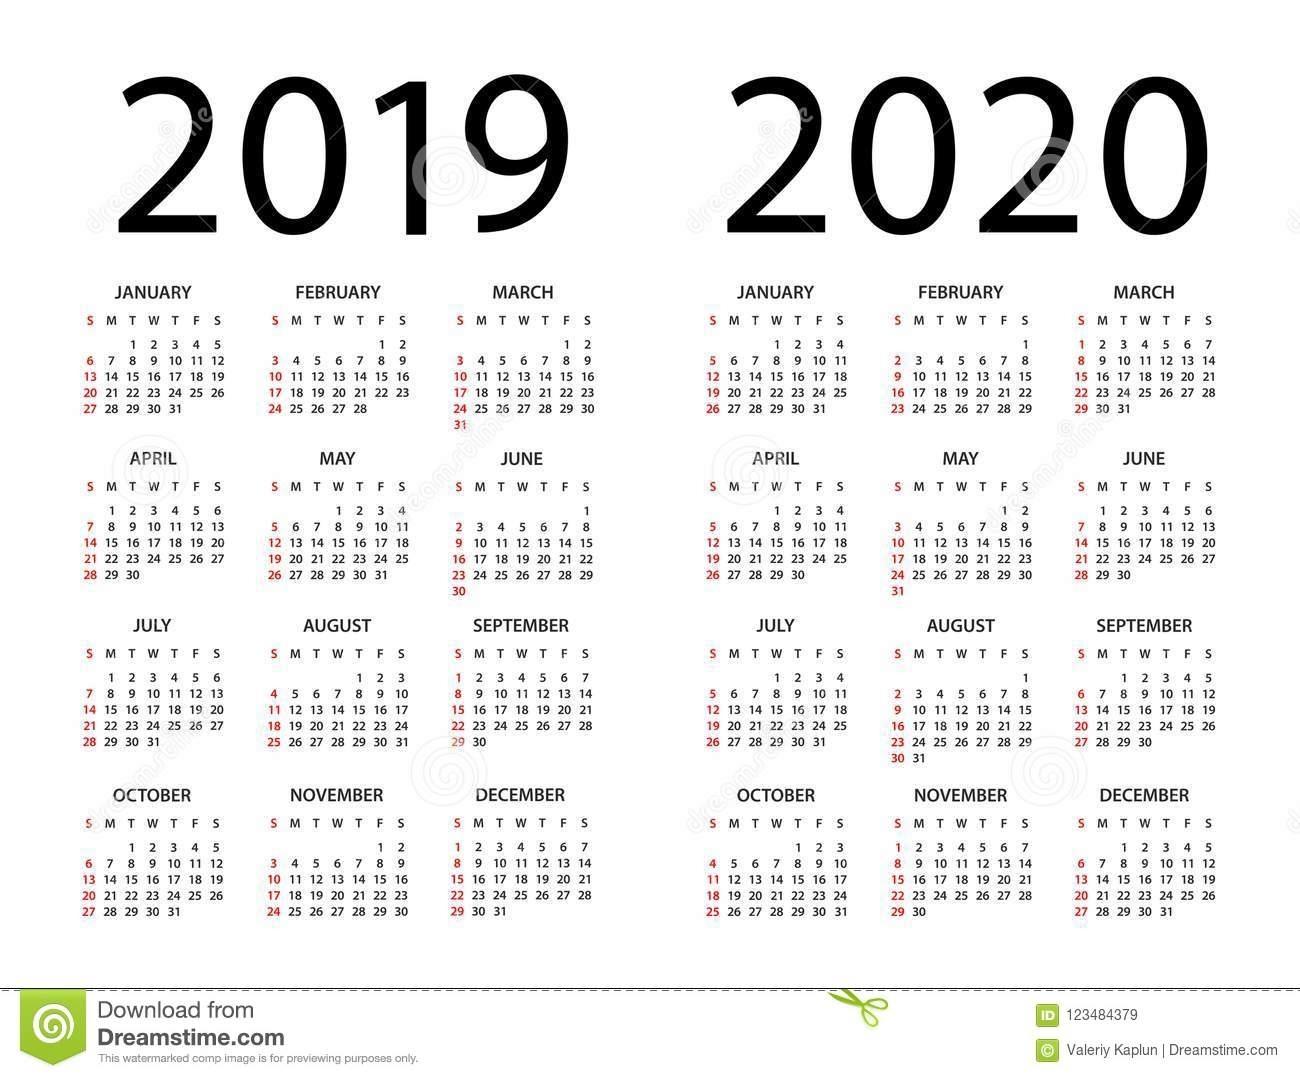 Calendar 2019 2020 - Illustration. Week Starts On Sunday Stock pertaining to 2019/2020 Calendars Starting On Monday